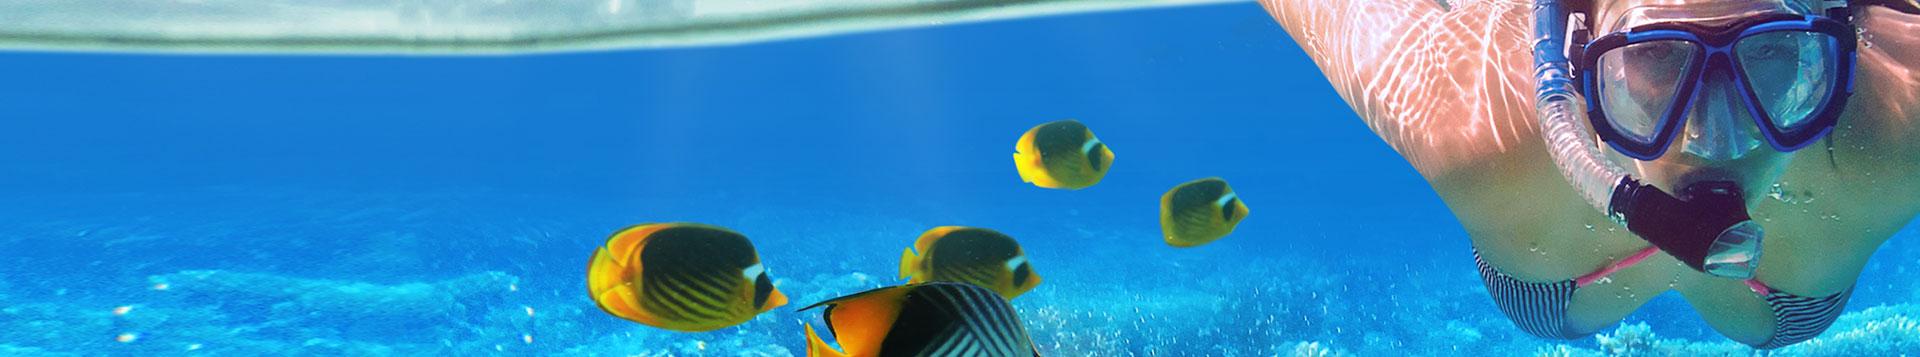 Snorkeling Spearfishing